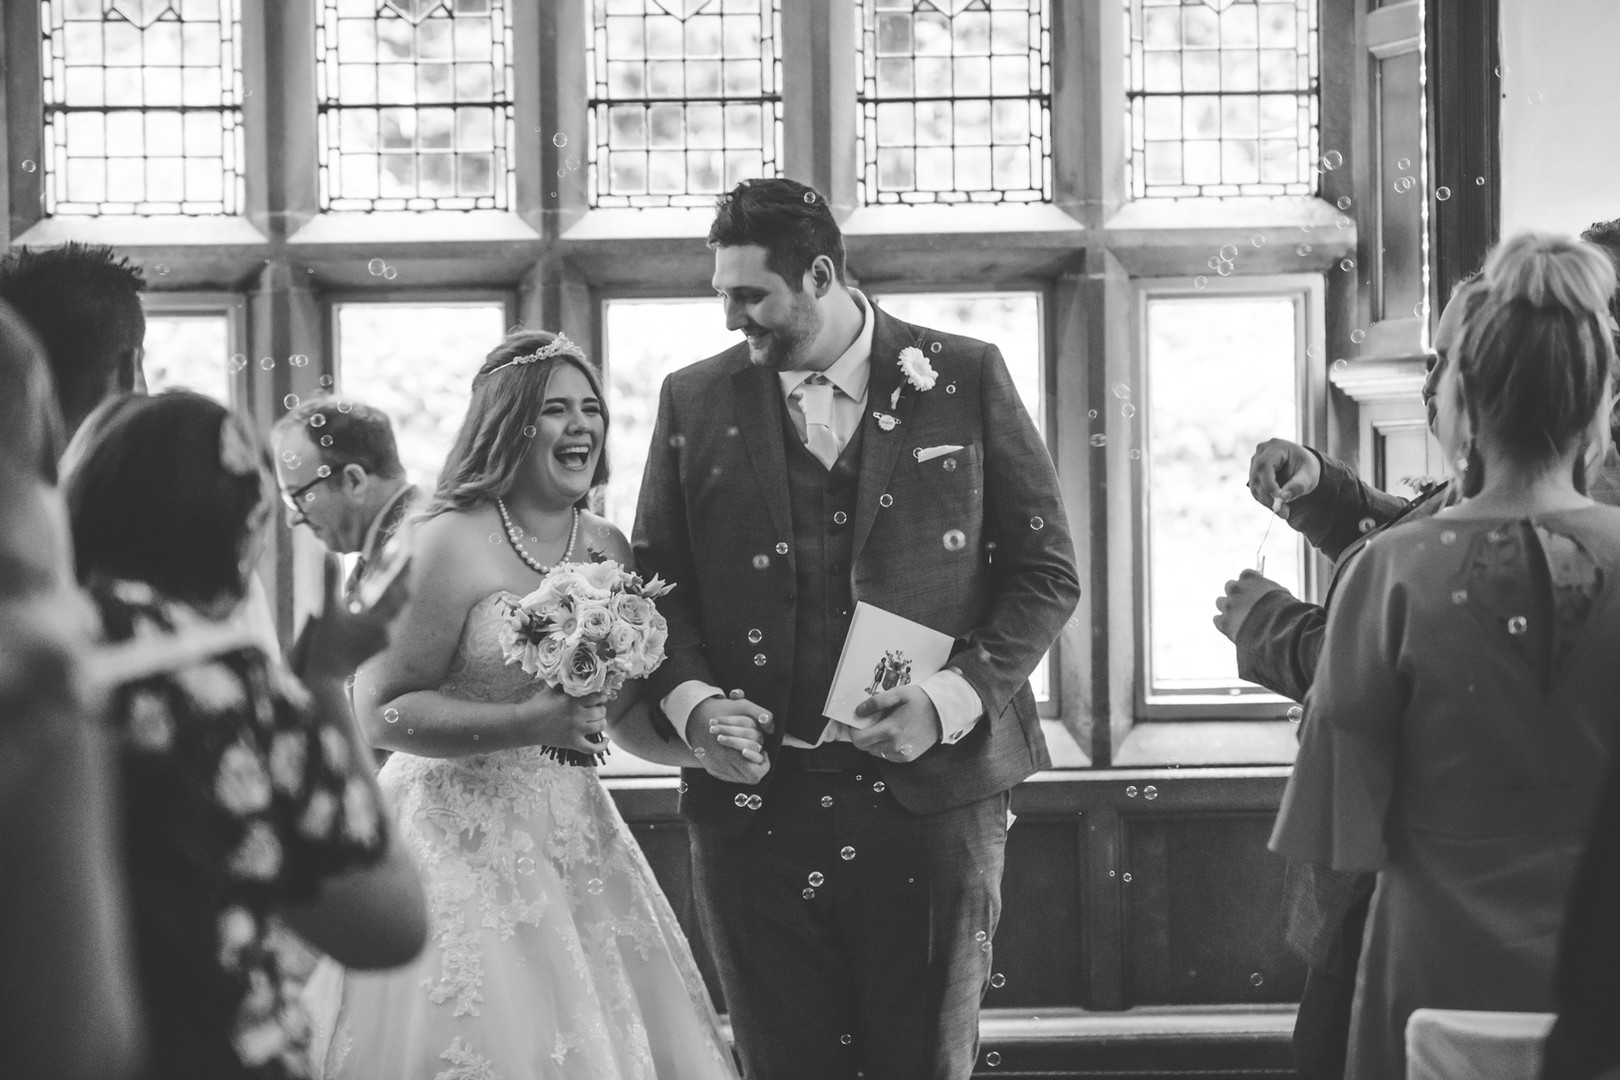 Wedding bubbles couple walking down isle